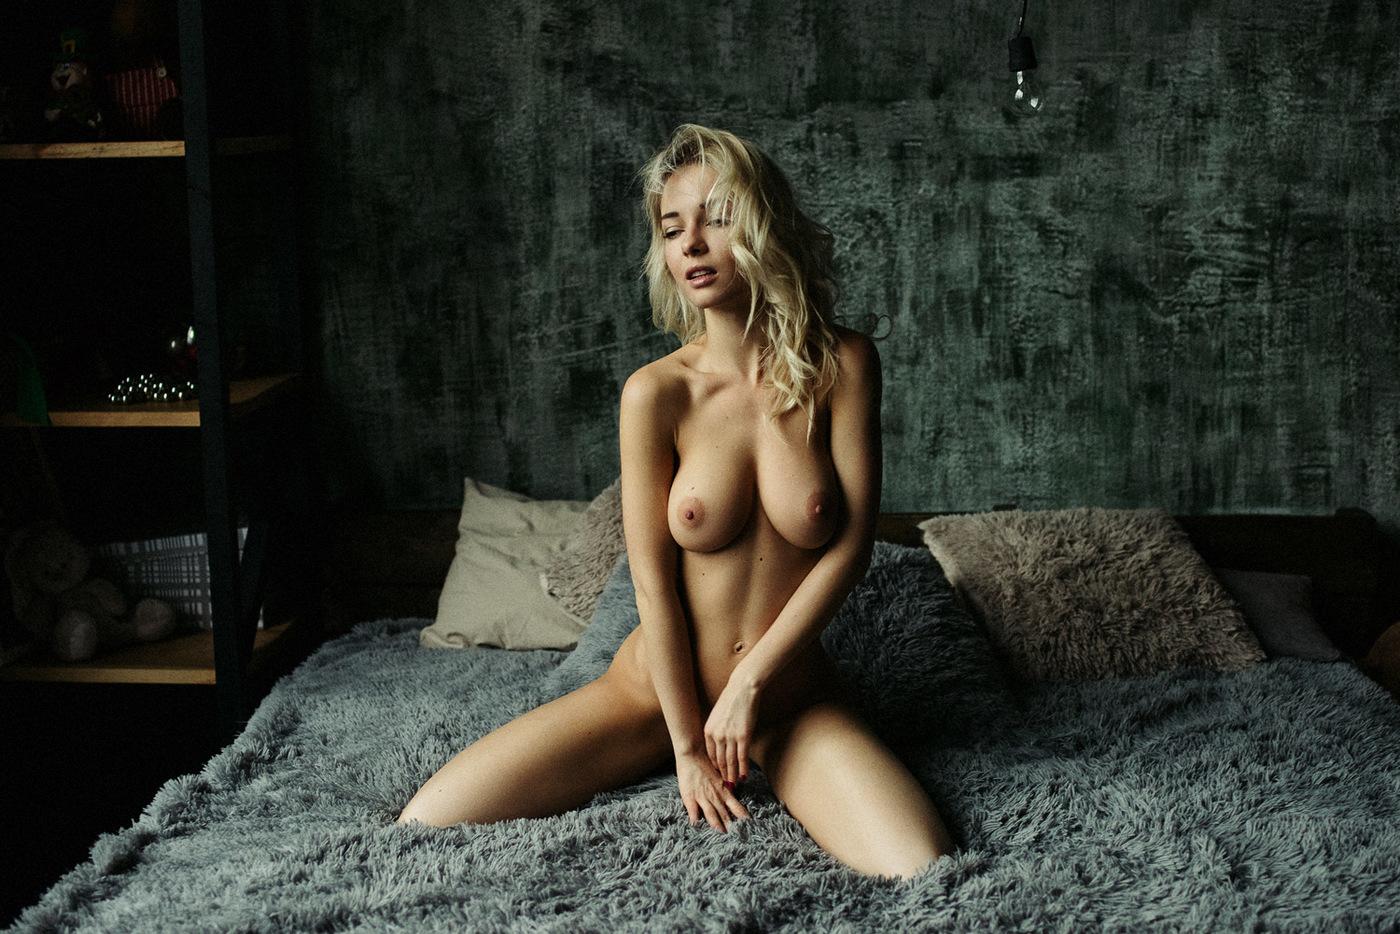 Eva Jude Erotic Photosession For Mobi Sex Photos HQ